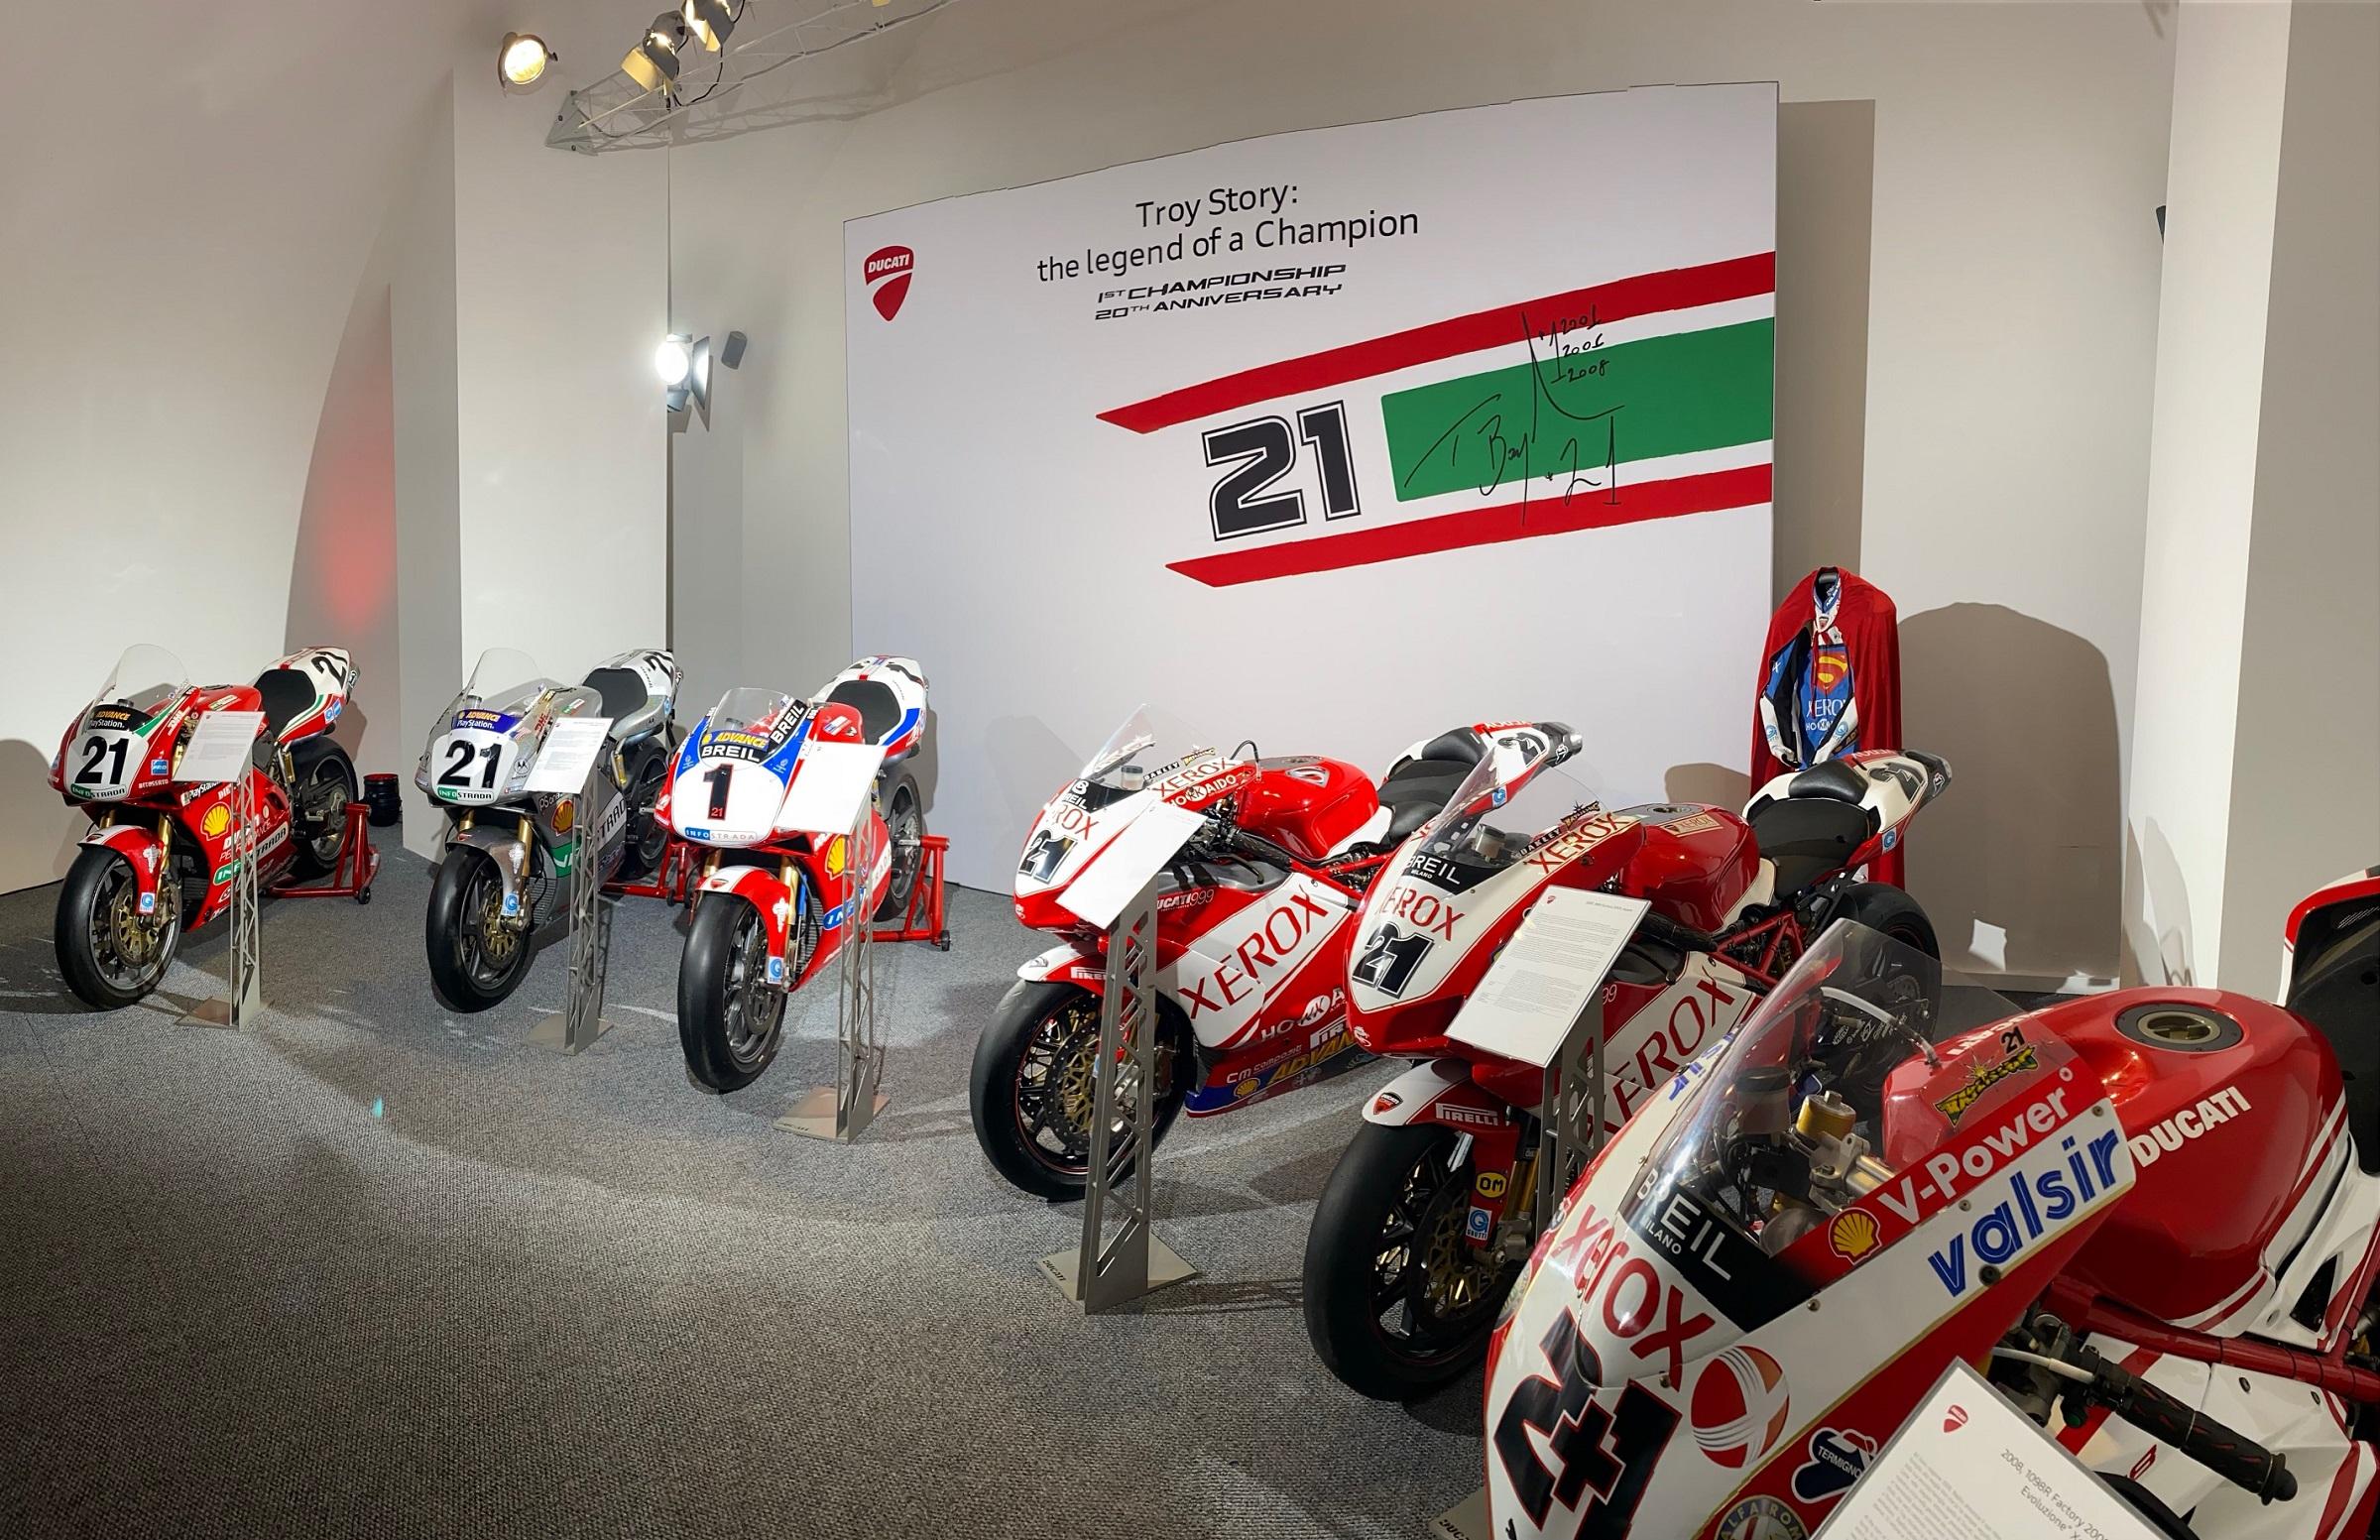 DUCATI Troy Story the Legend of a Champion 2 Μουσείο Ducati : Θεματική έκθεση για τα 20 χρόνια από τον πρώτο παγκόσμιο τίτλο του Troy Bayliss Ducati, ειδήσεις, Νέα